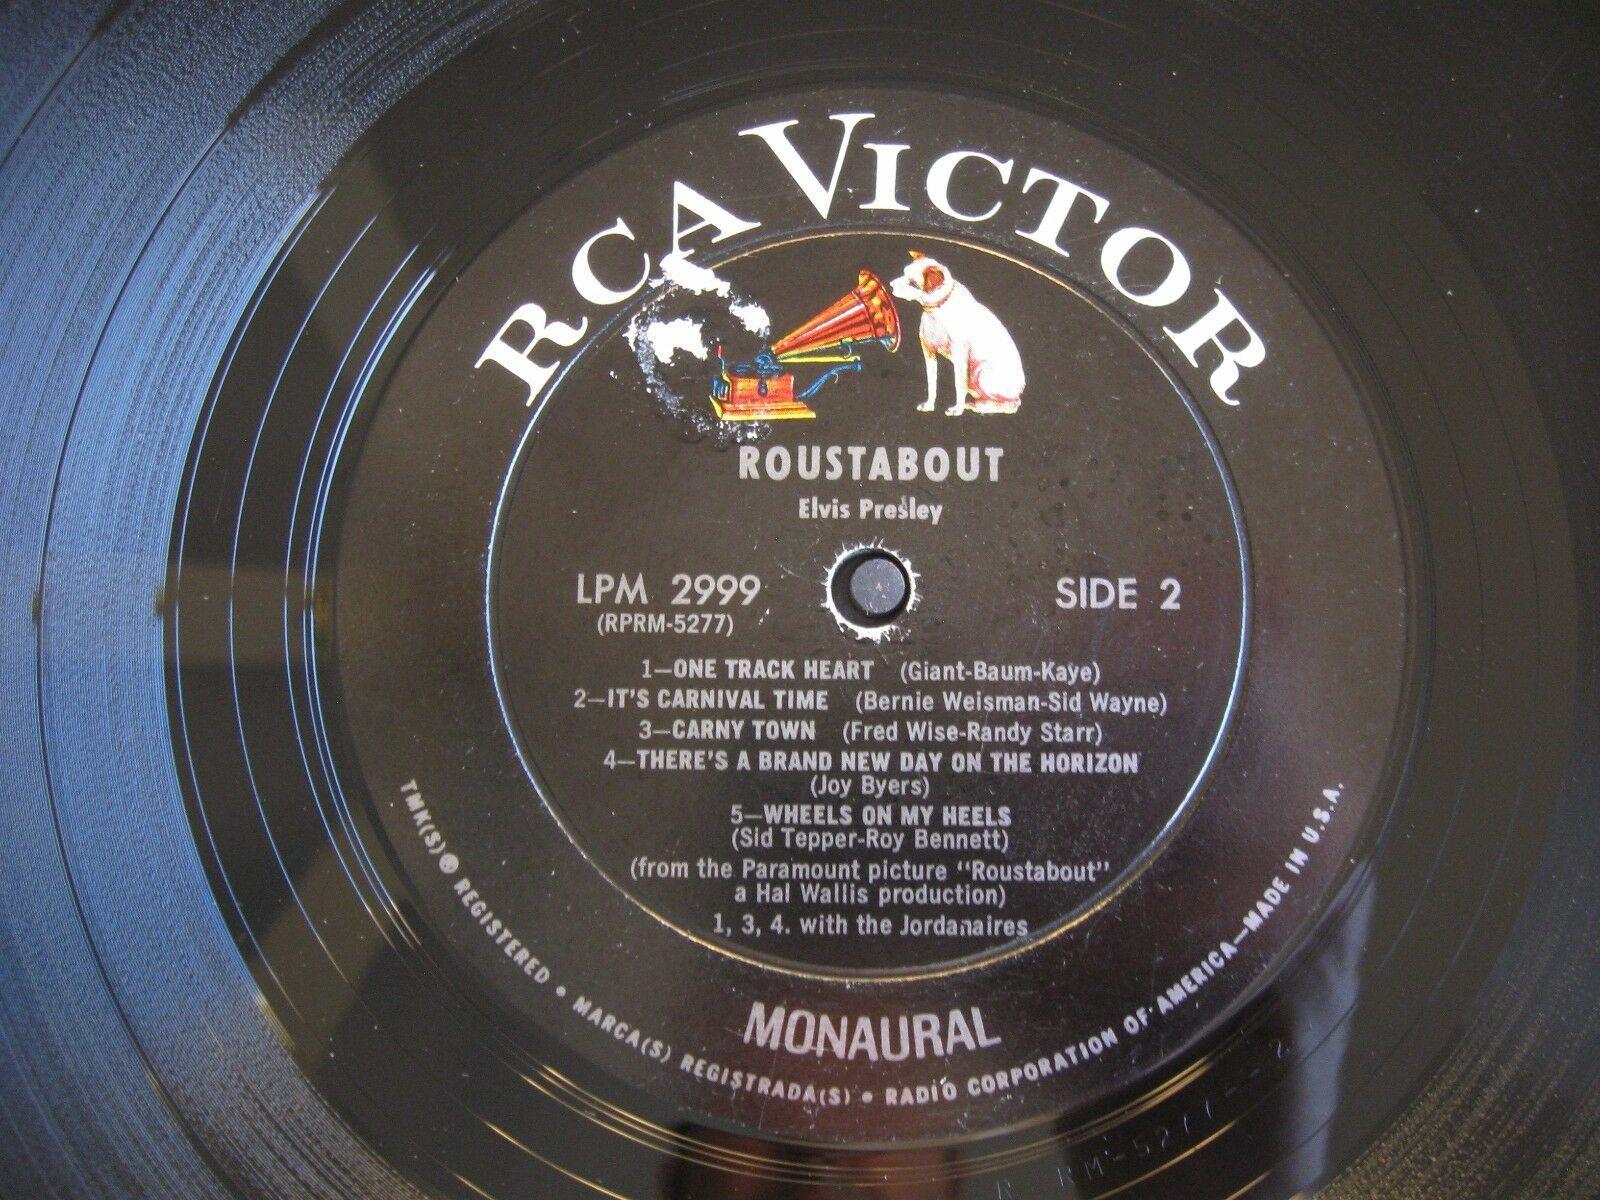 Elvis Presley Roustabout RCA LPM-2999 Mono Vinyl Record LP image 5